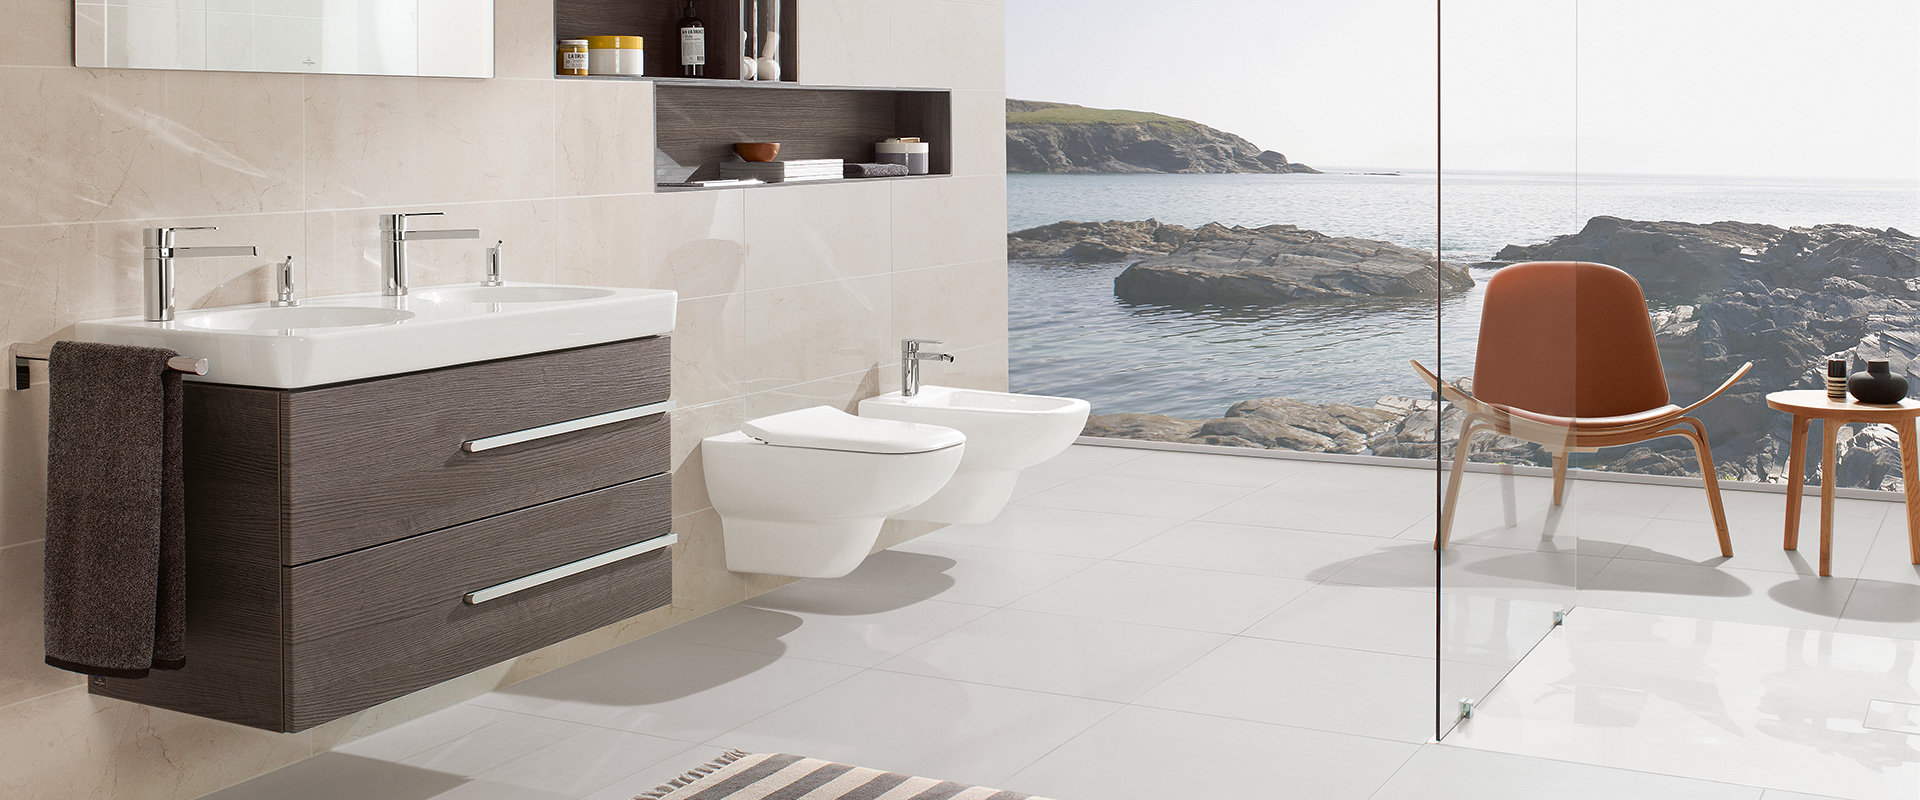 Villeroy Boch Badezimmer Set Inspiration